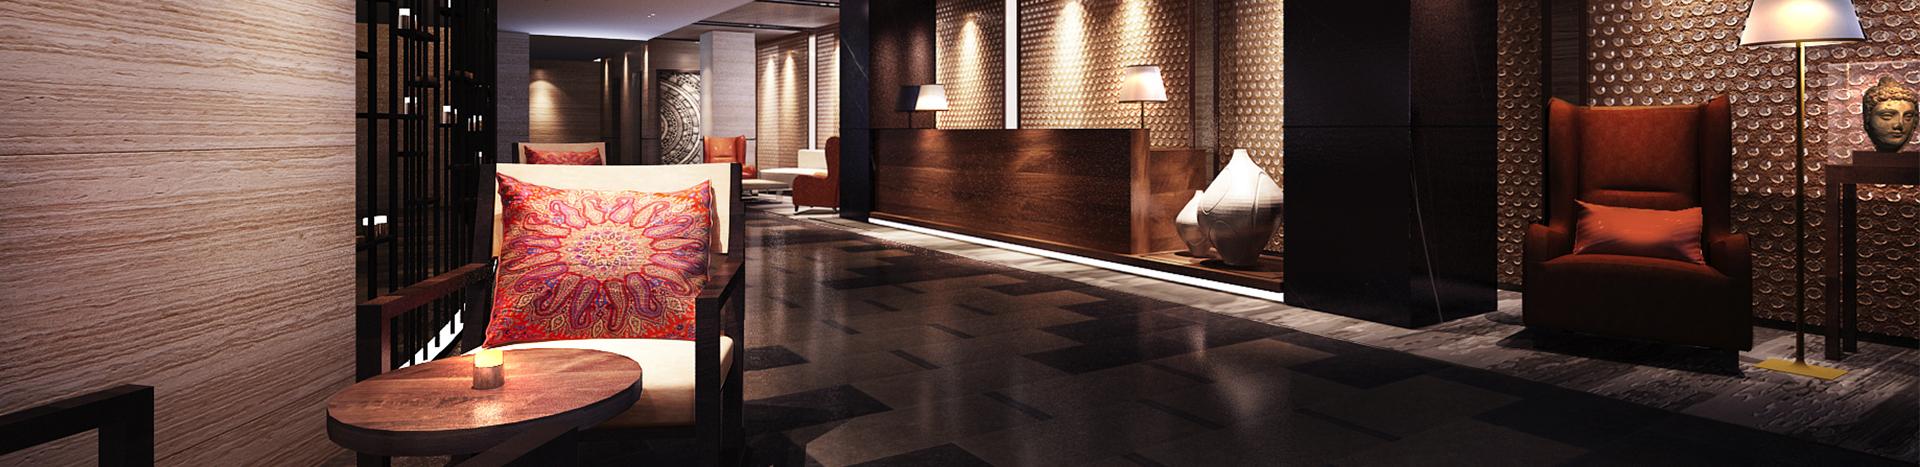 kayre-international-hotel-interior-lahore-architecture-sohohospitality